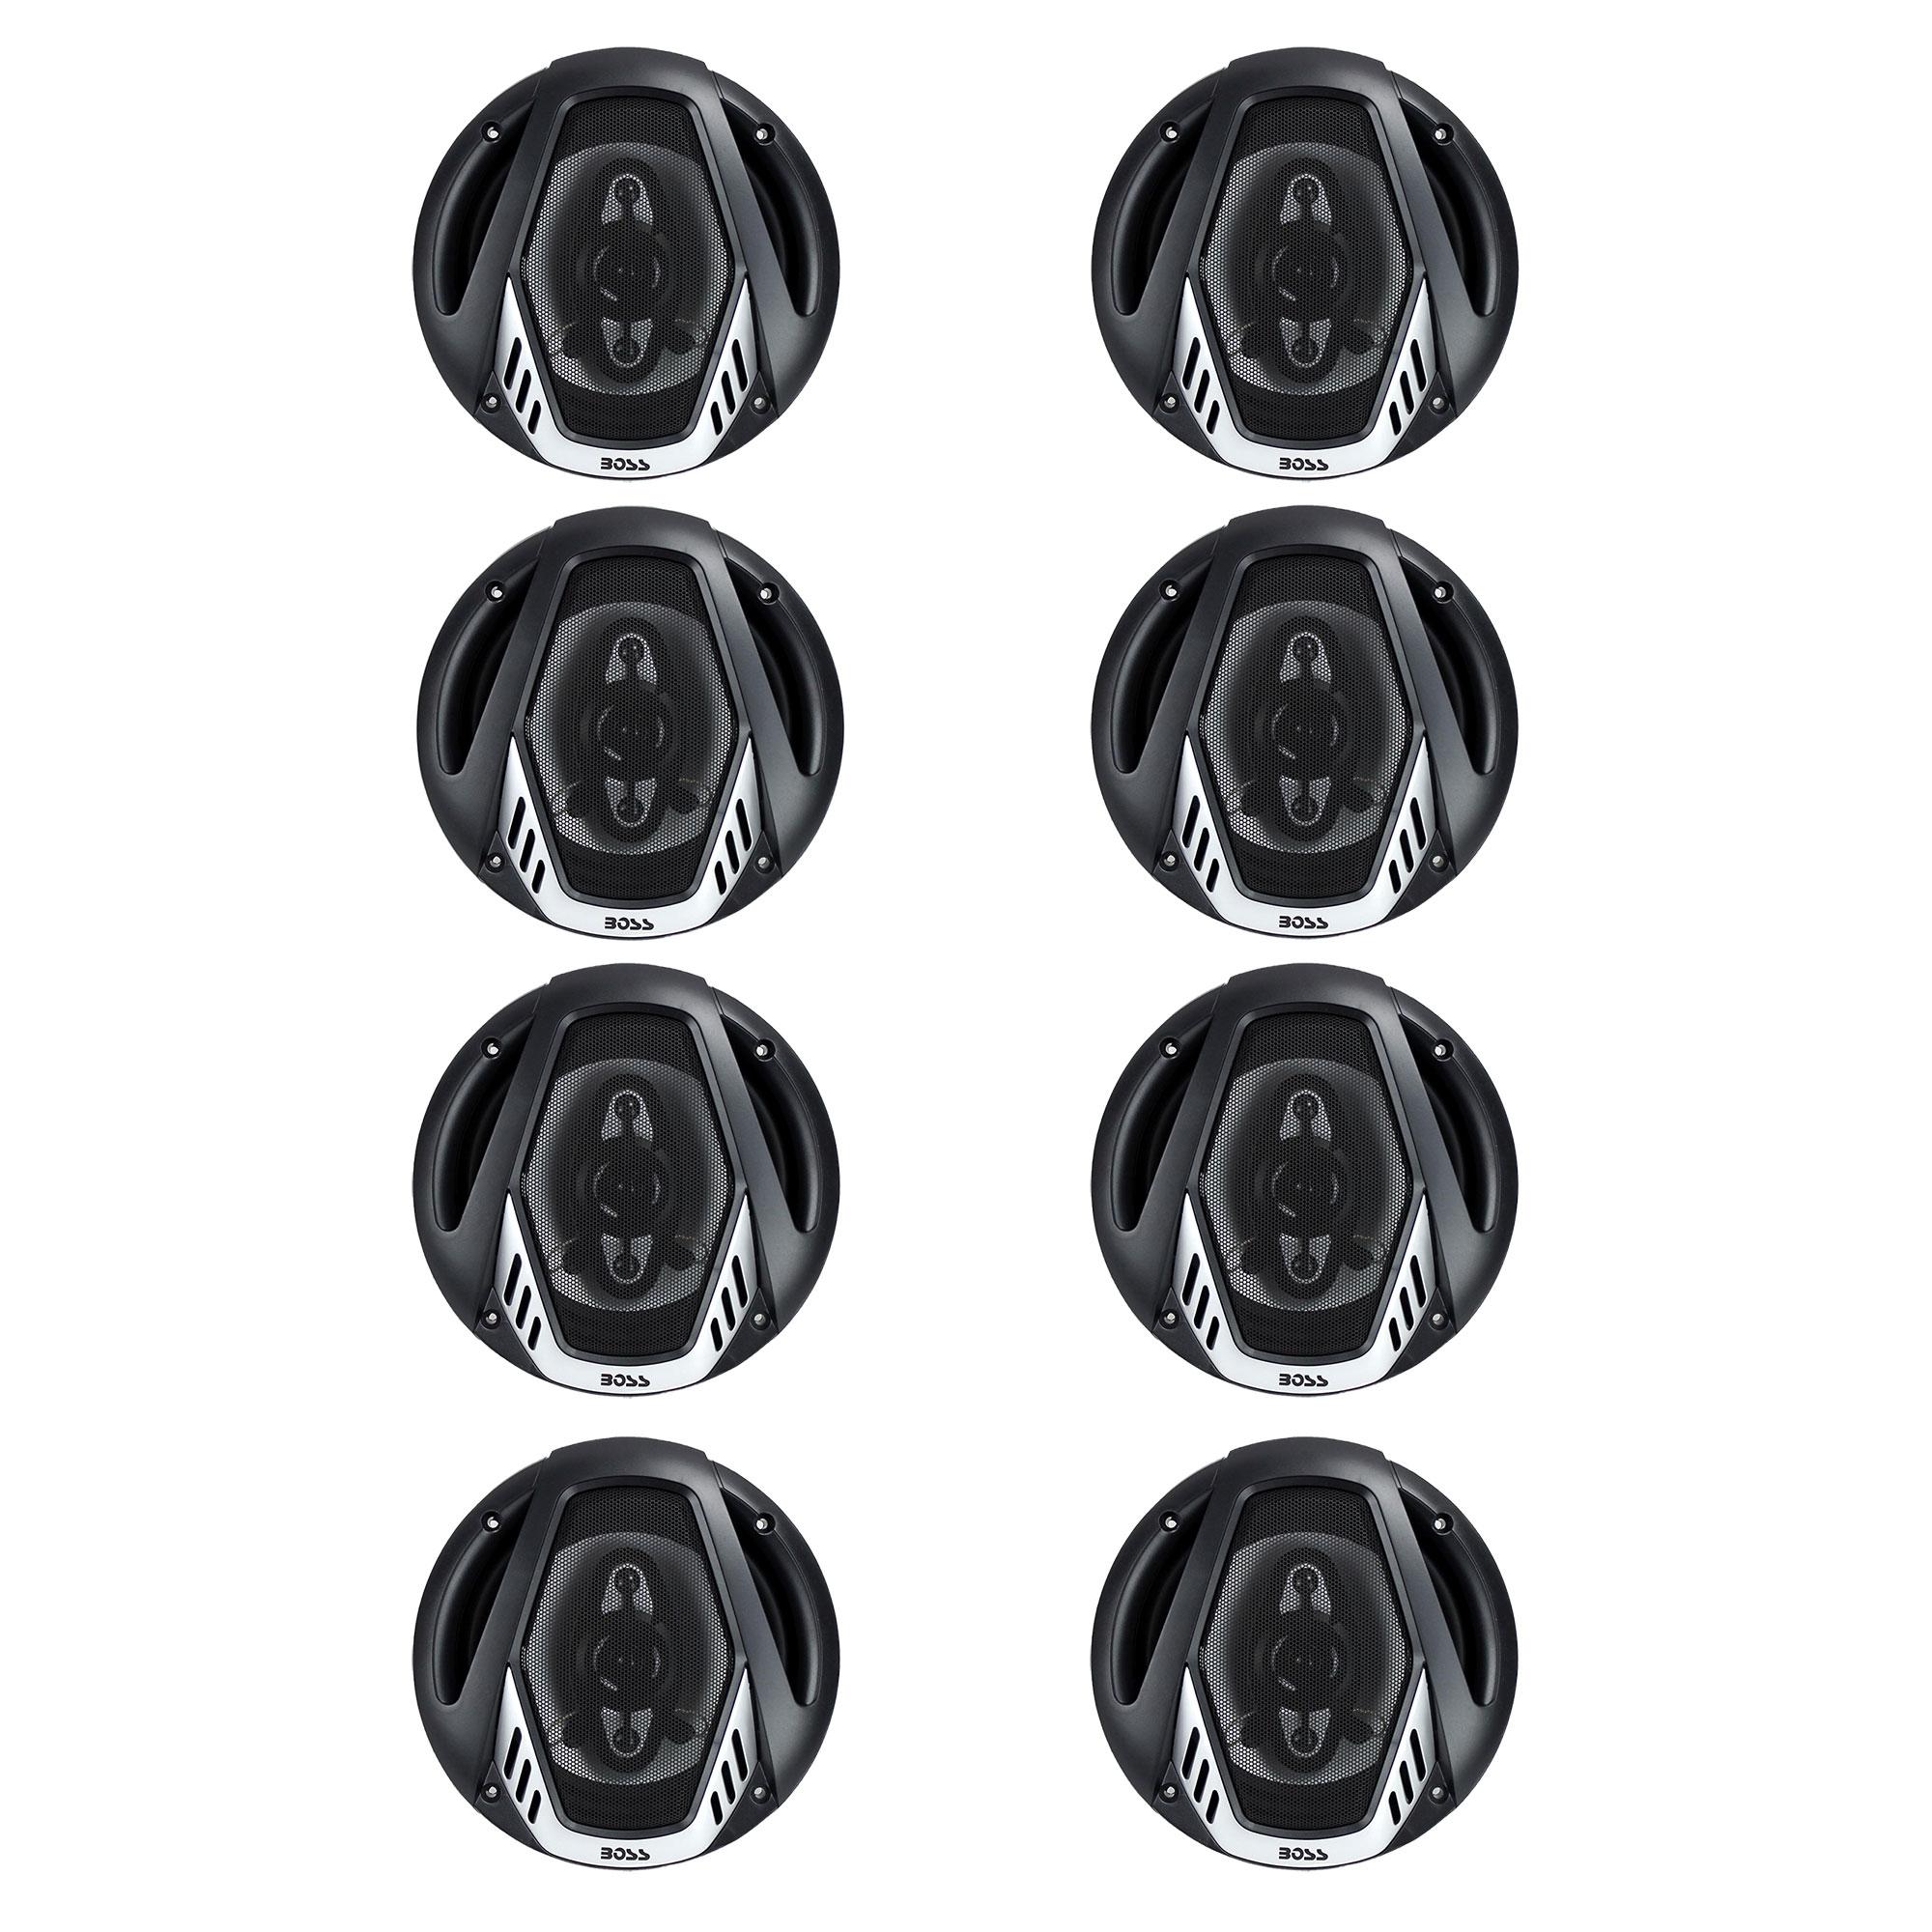 "BOSS NX654 6.5"" 400W 4-Way Car Audio Coaxial Speakers"